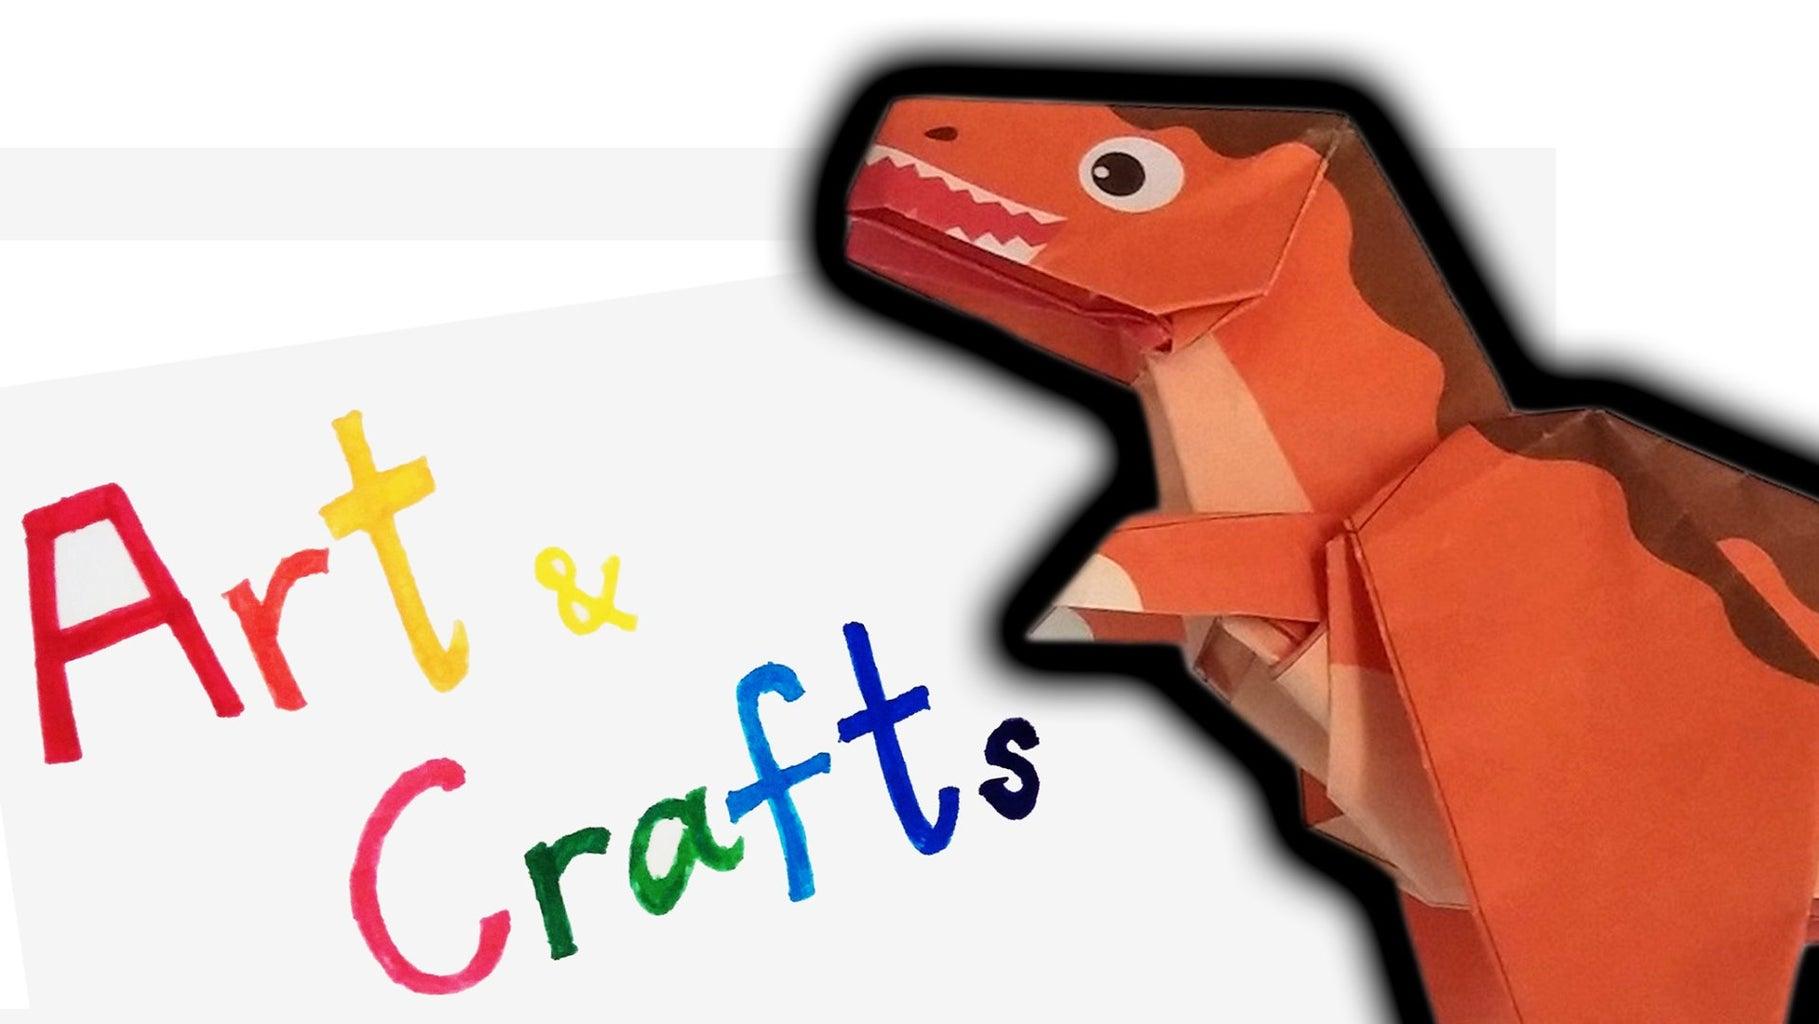 Show How to Fold Dinosaur Tyrannosaurus Part 1 and 2 ORIGAMI How to Fold Dinosaur Tyrannosaurus Part 1 and 2 Origami